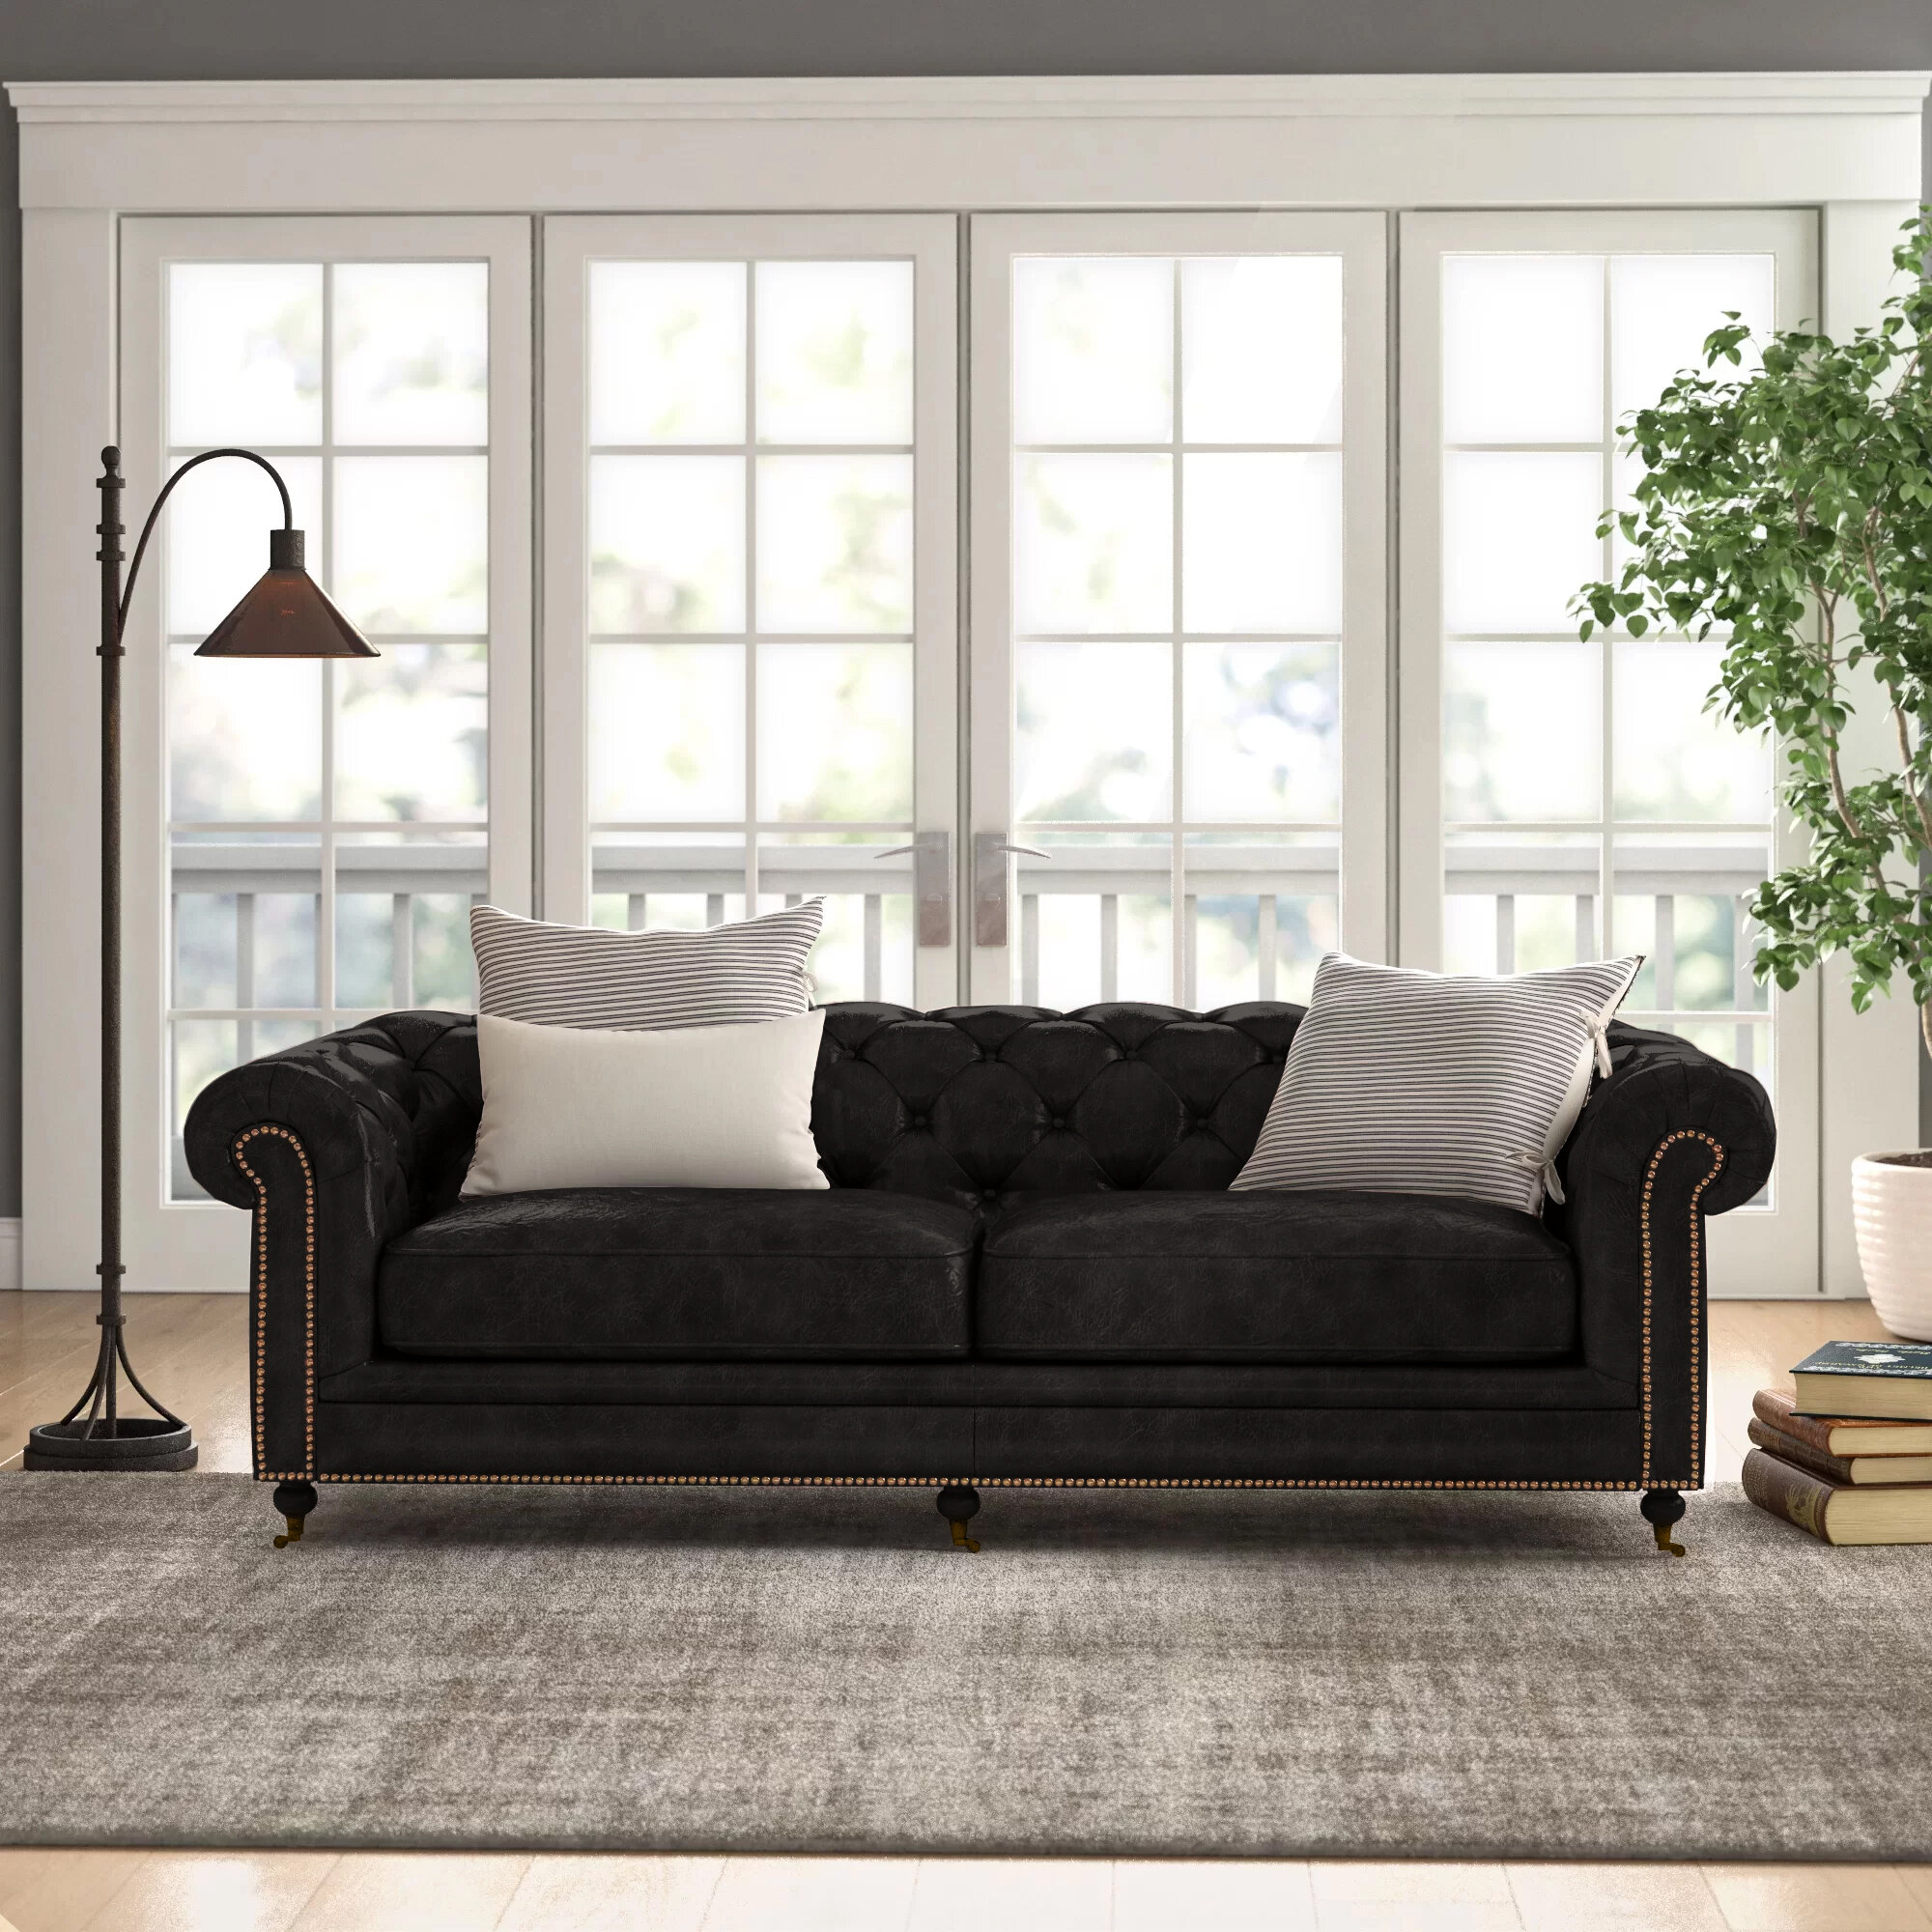 Larsen 89 Genuine Leather Chesterfield Rolled Arm Sofa Reviews Birch Lane